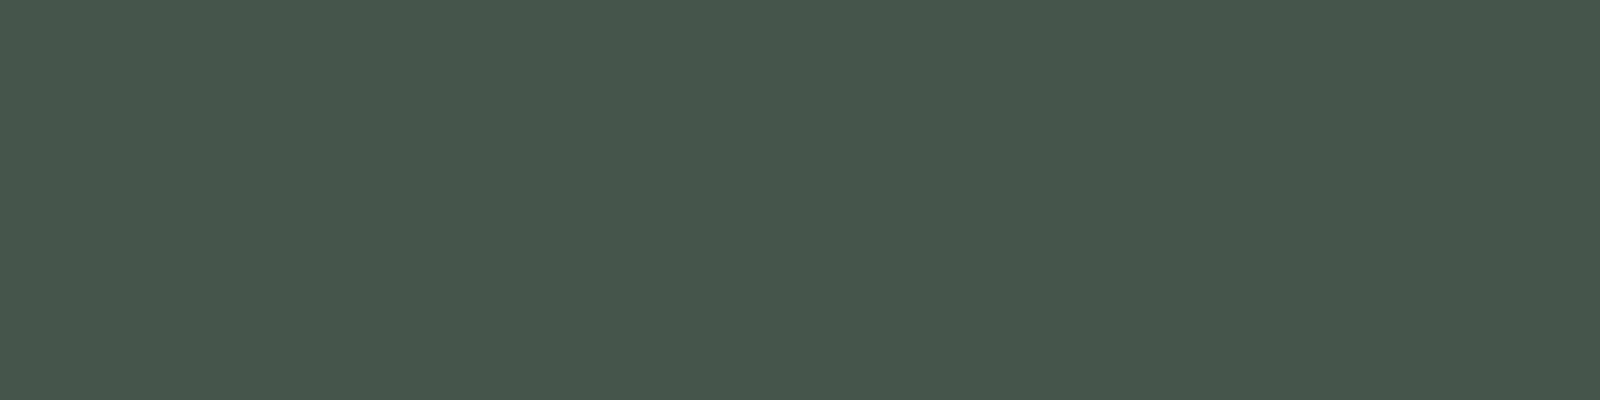 204 Grecian Green Gutter Color